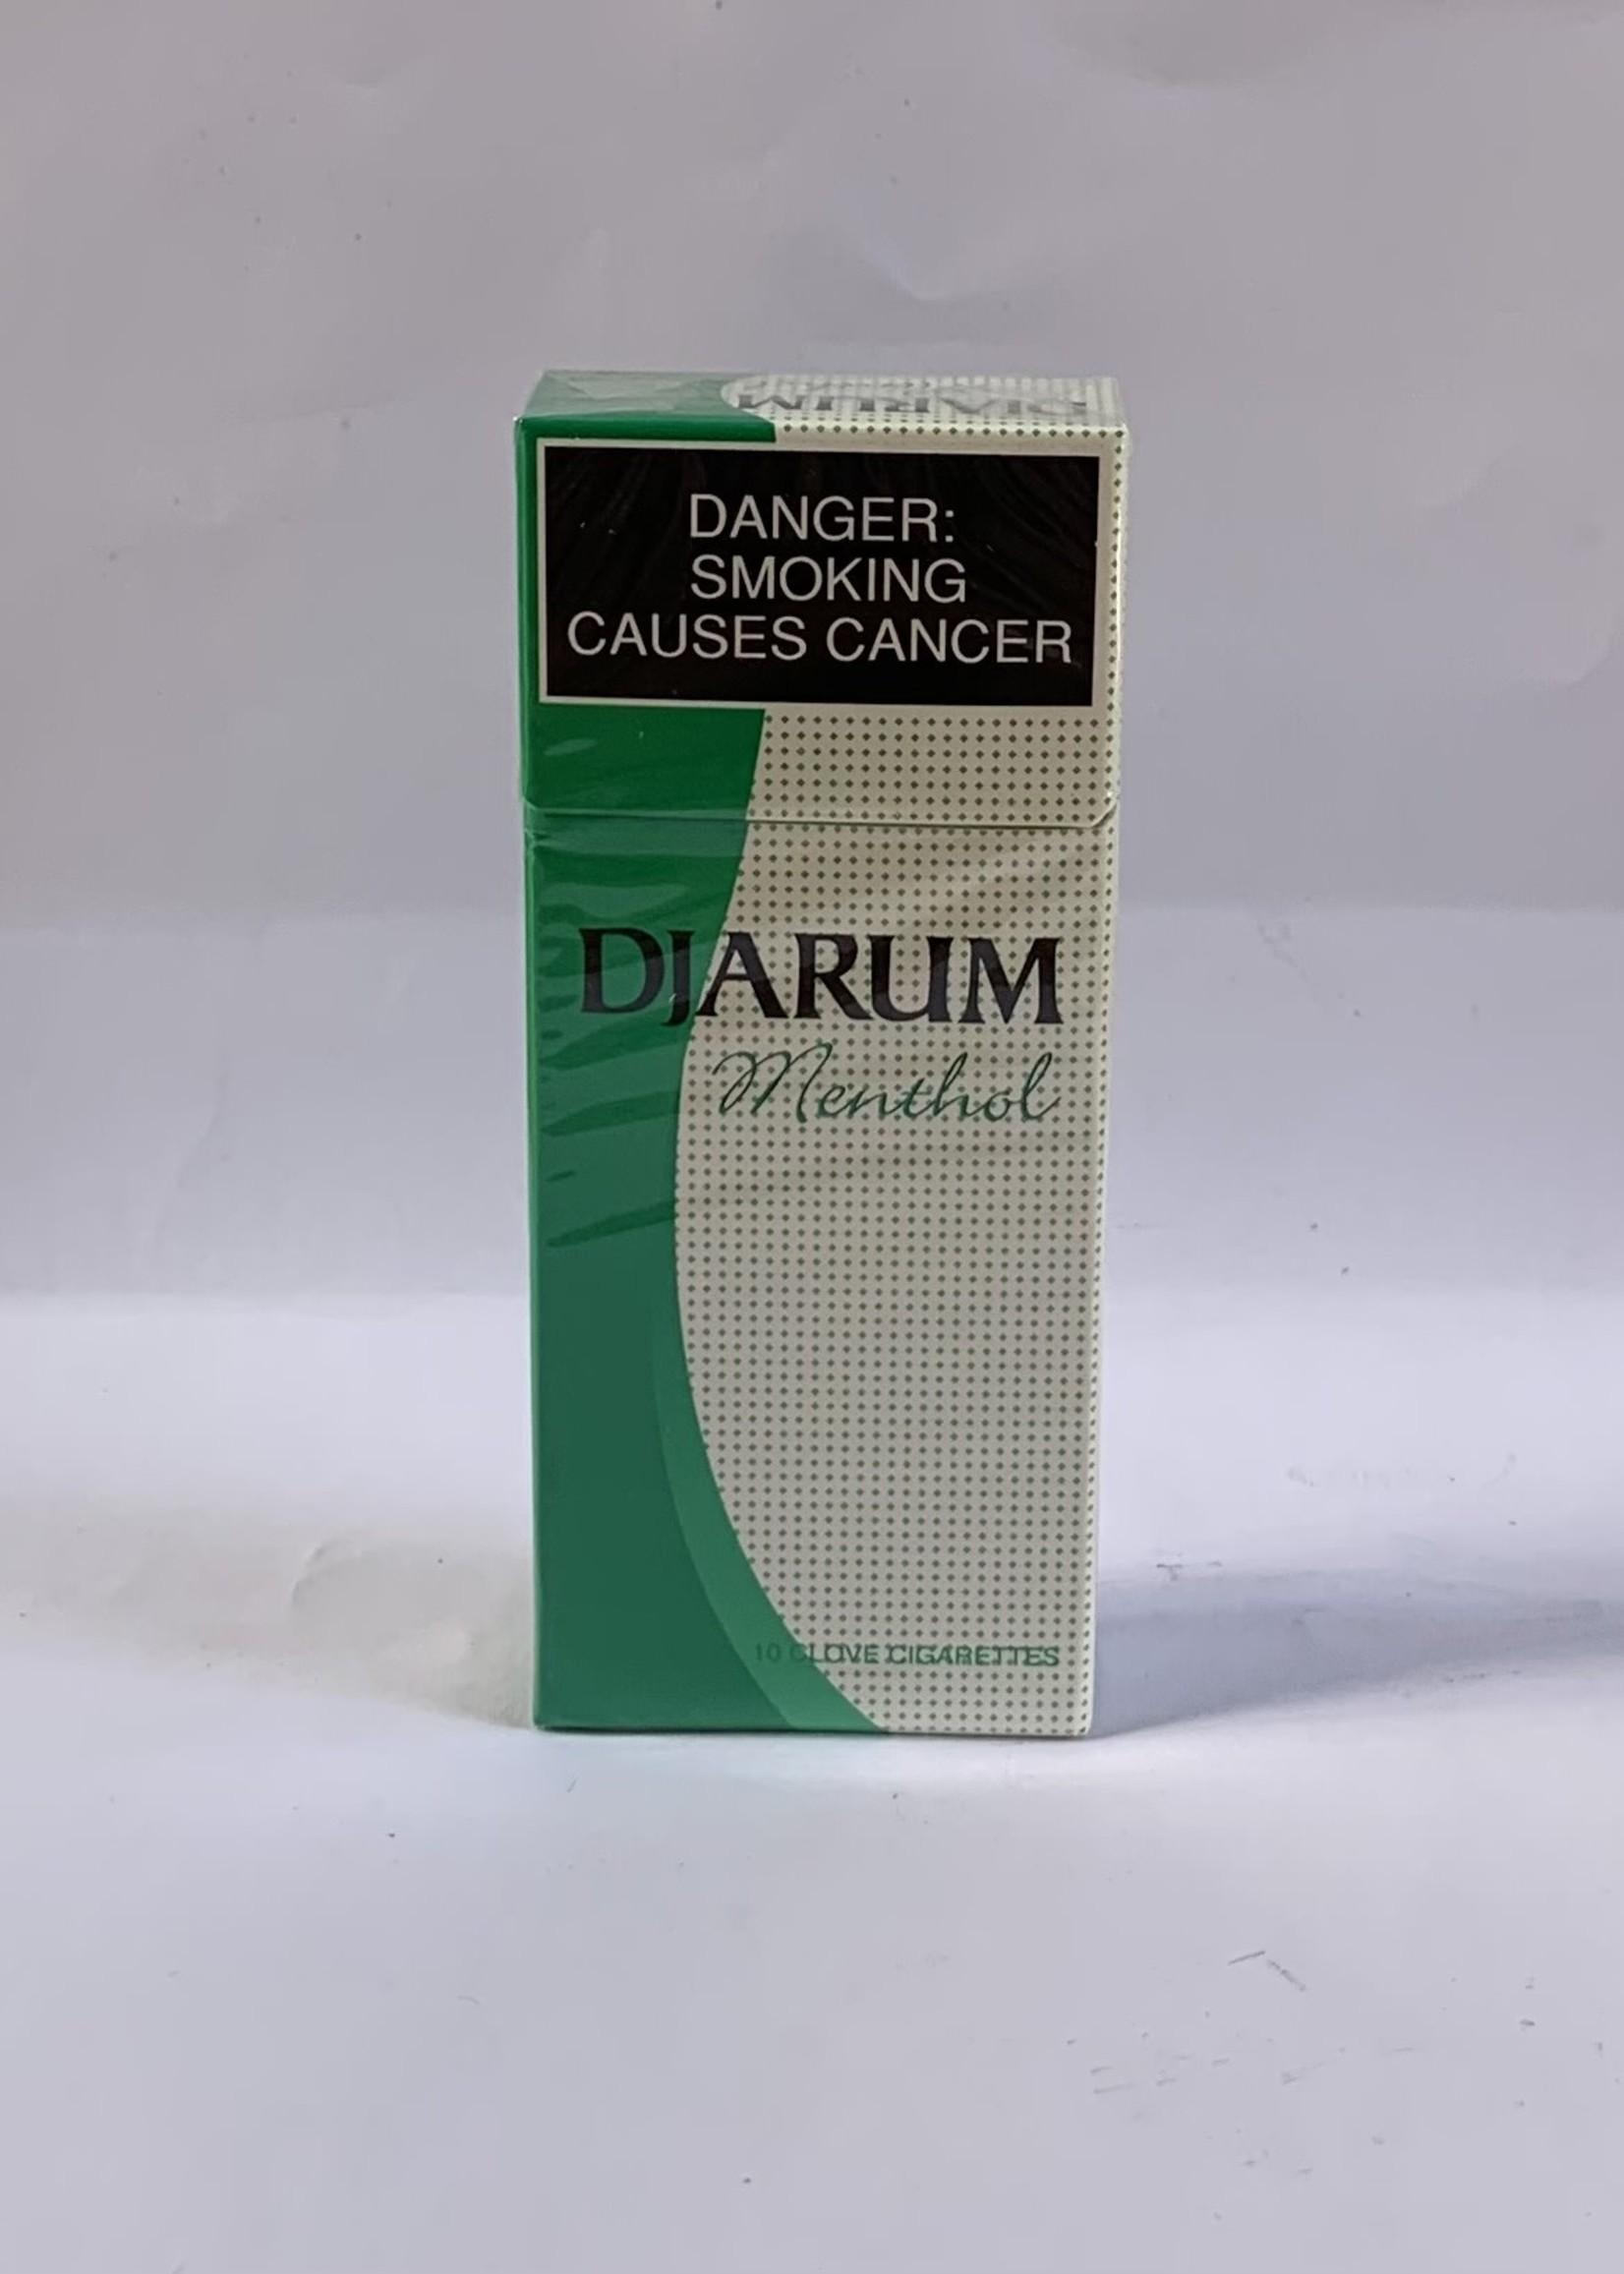 Djarum clove cigarettes - menthol